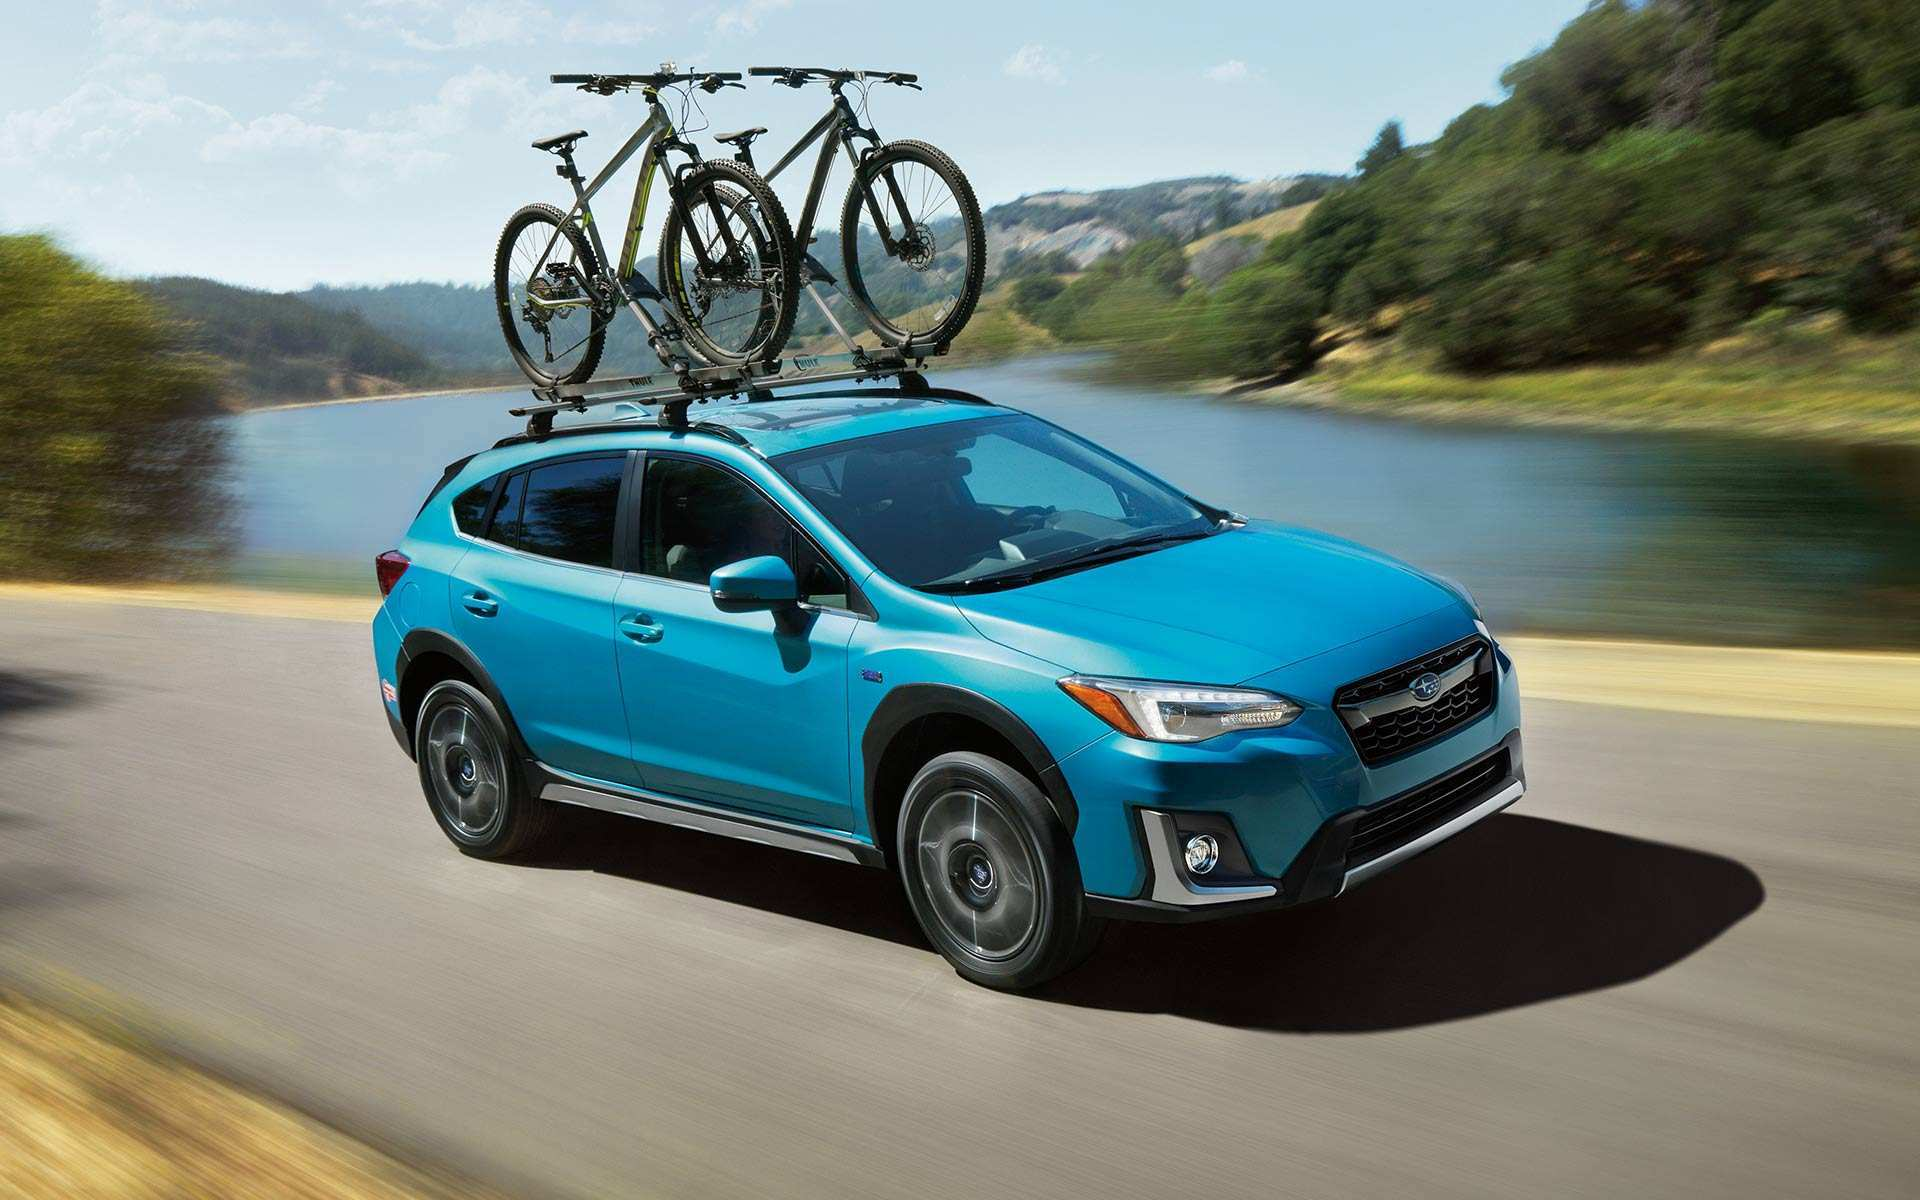 90 All New Subaru Impreza Hybrid 2020 Specs and Review for Subaru Impreza Hybrid 2020